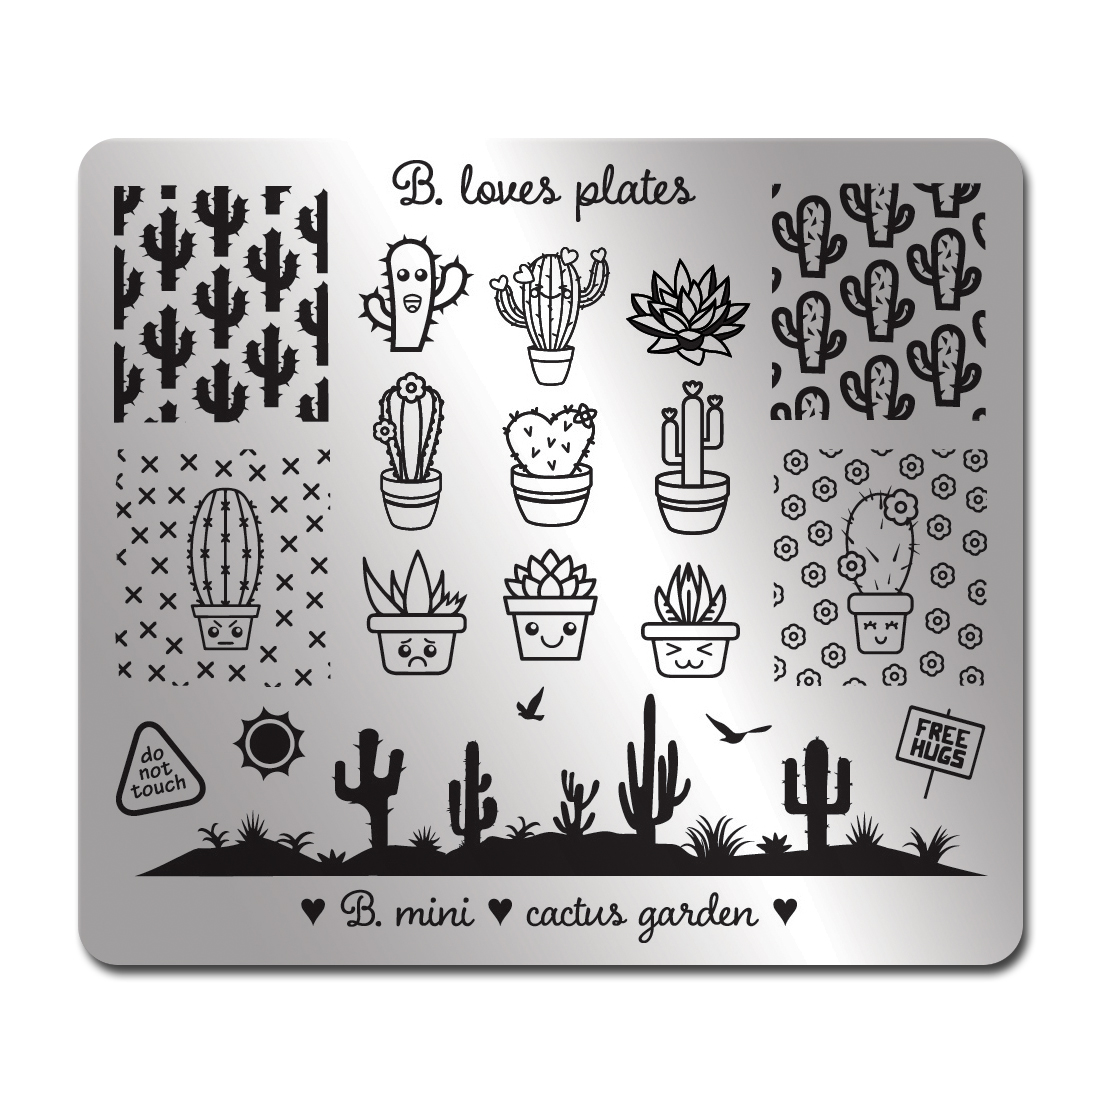 B-loves-plates-B-mini-cactus-garden-plytki-do-stempli-stamping-square